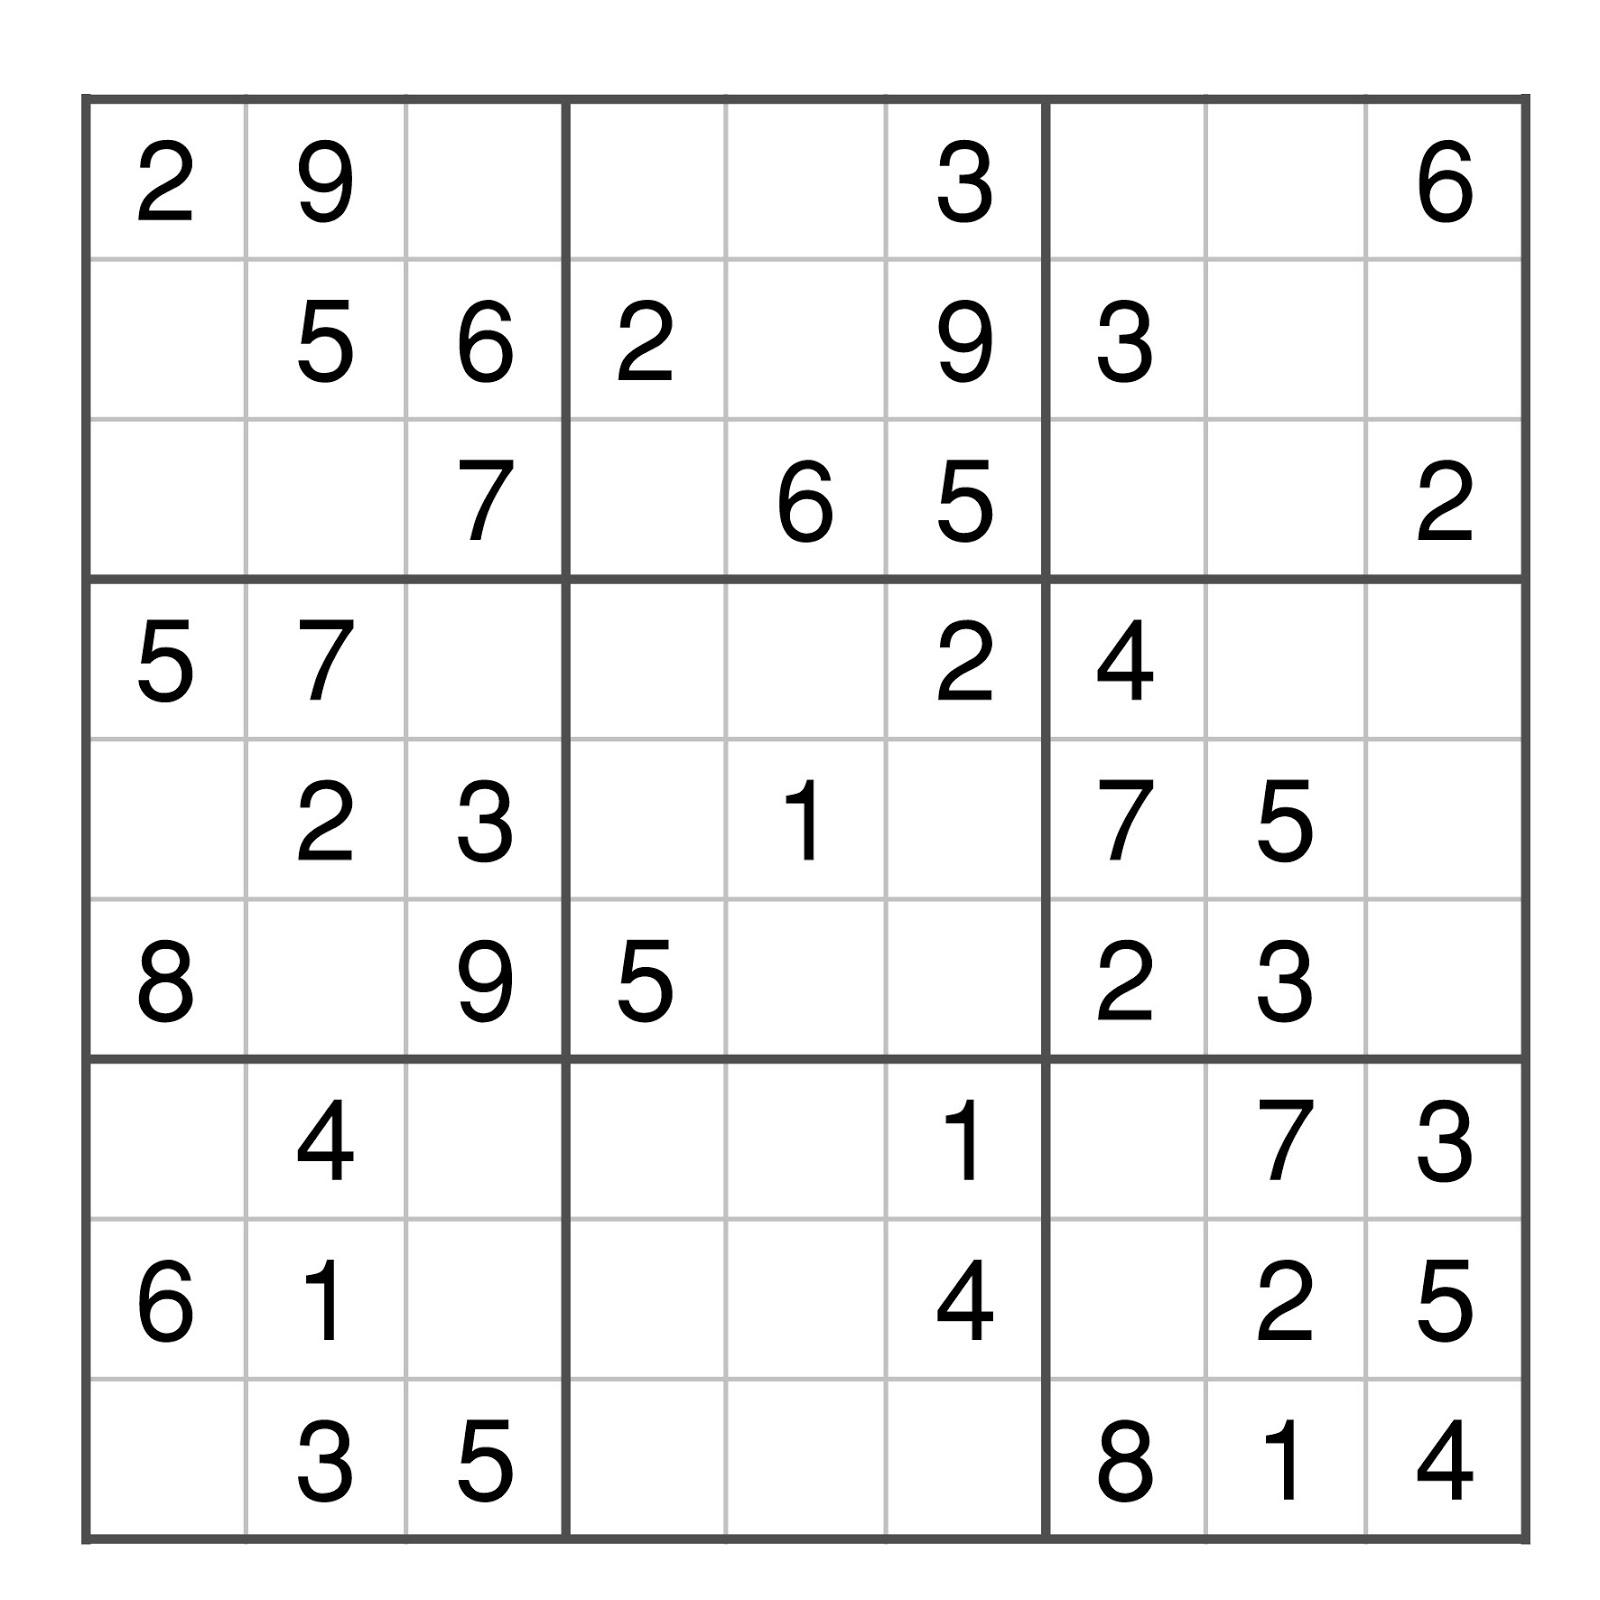 Jeu De Sudoku En Ligne Gratuit destiné Sudoku Gratuit En Ligne Facile